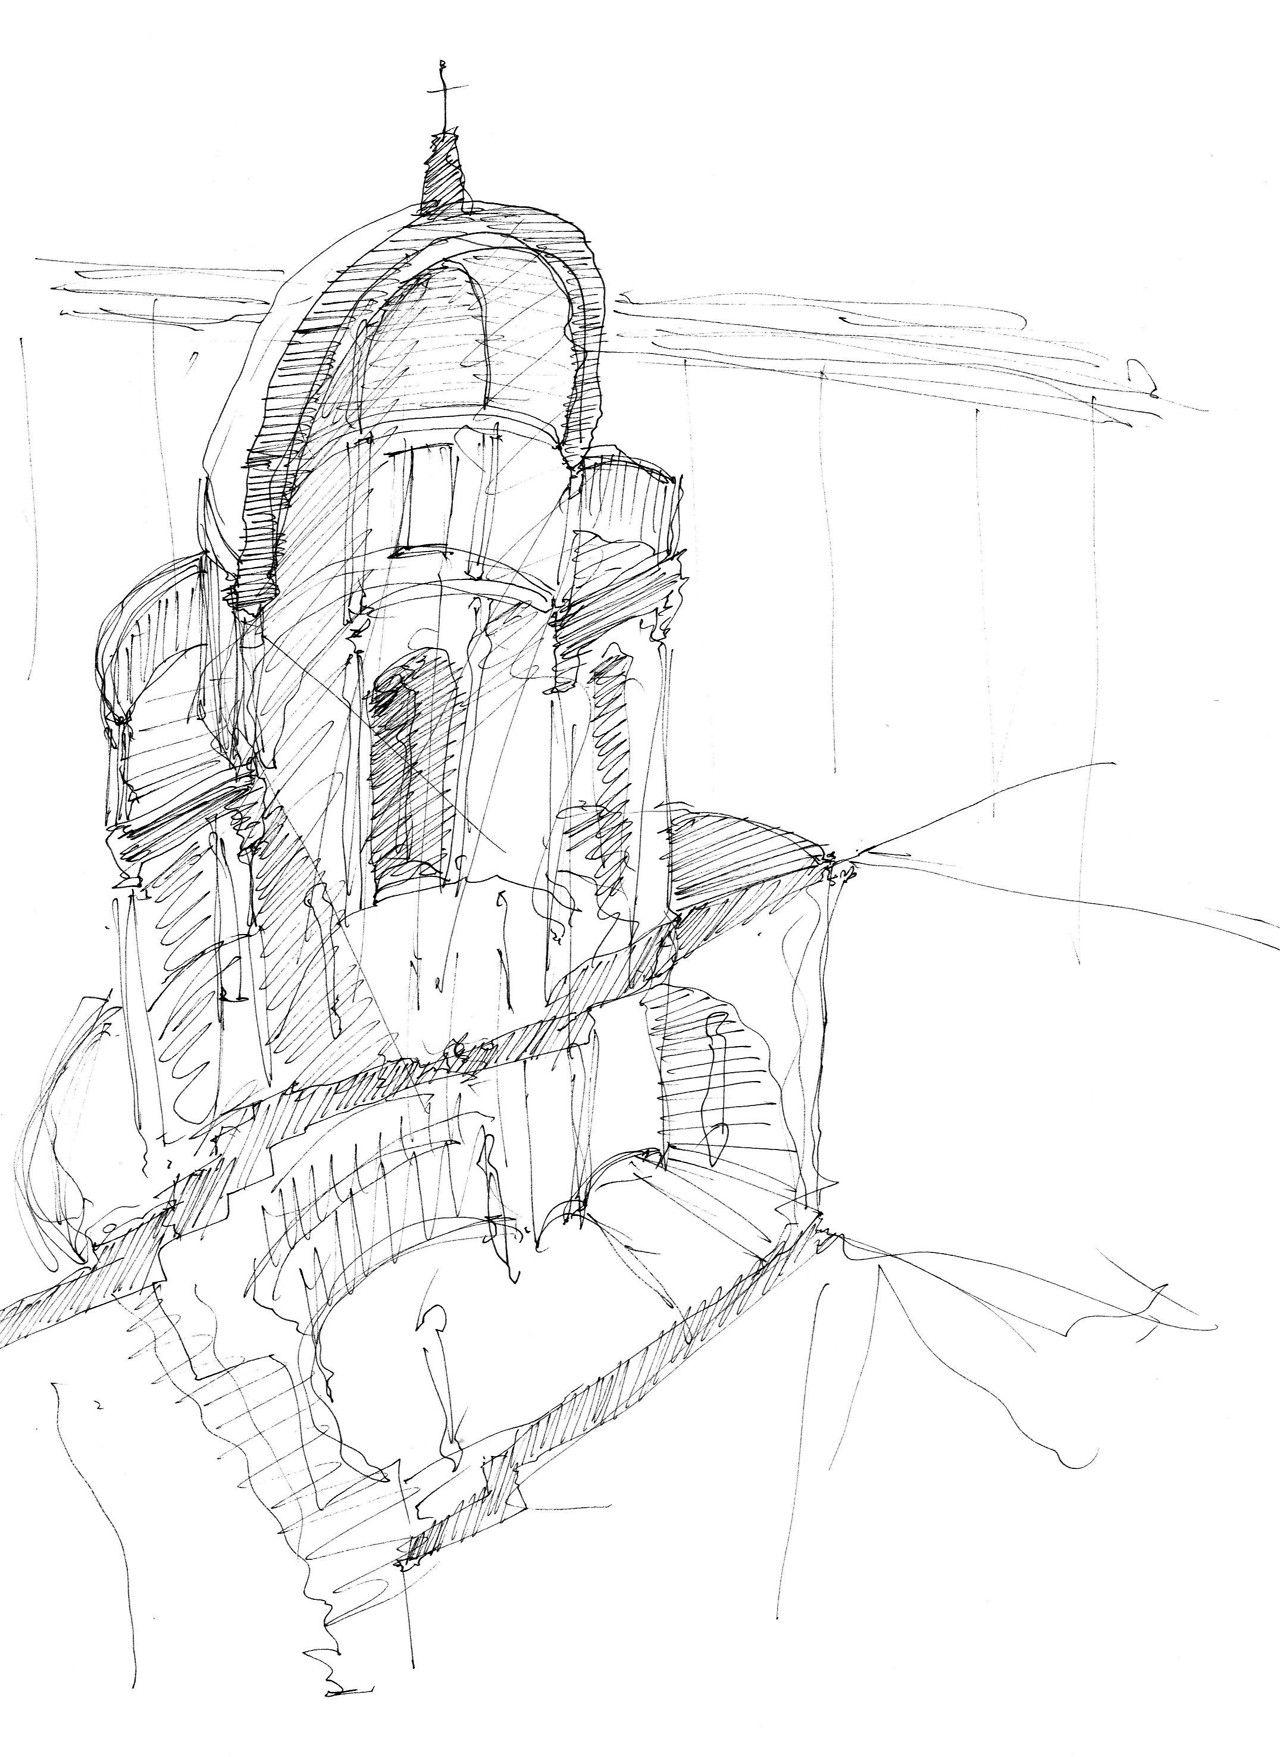 tonsarchitecture  Tempietto, Rome  Sketch Section  Pen   Все дороги ... b39ac4efe4b